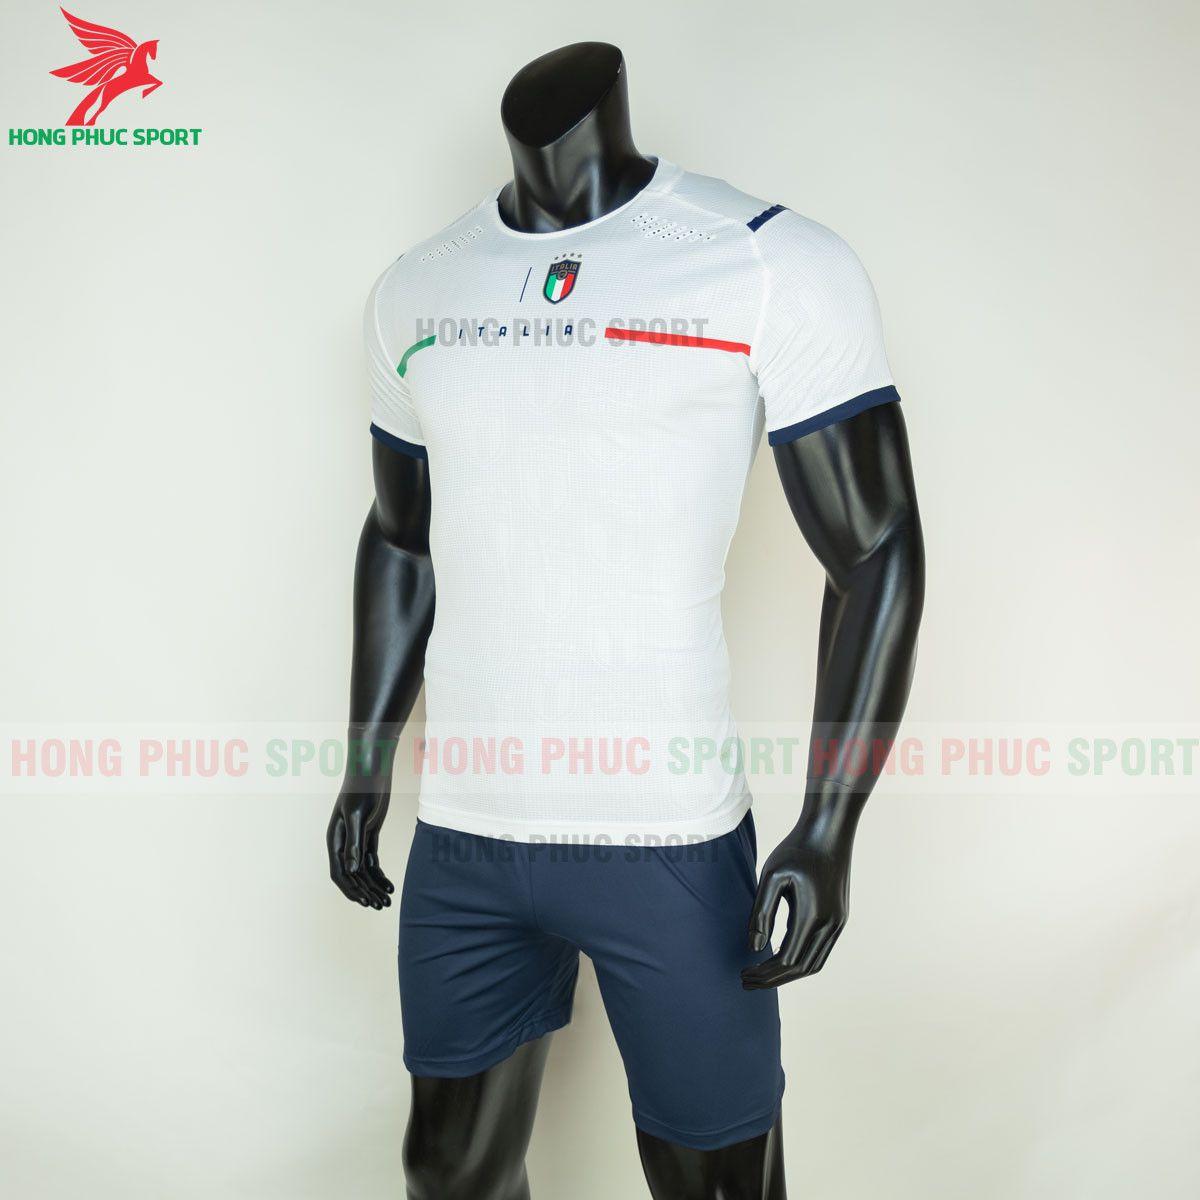 https://cdn.hongphucsport.com/unsafe/s4.shopbay.vn/files/285/ao-bong-da-tuyen-italia-2021-san-khach-hang-thai-4-60d2fefaa2040.jpg